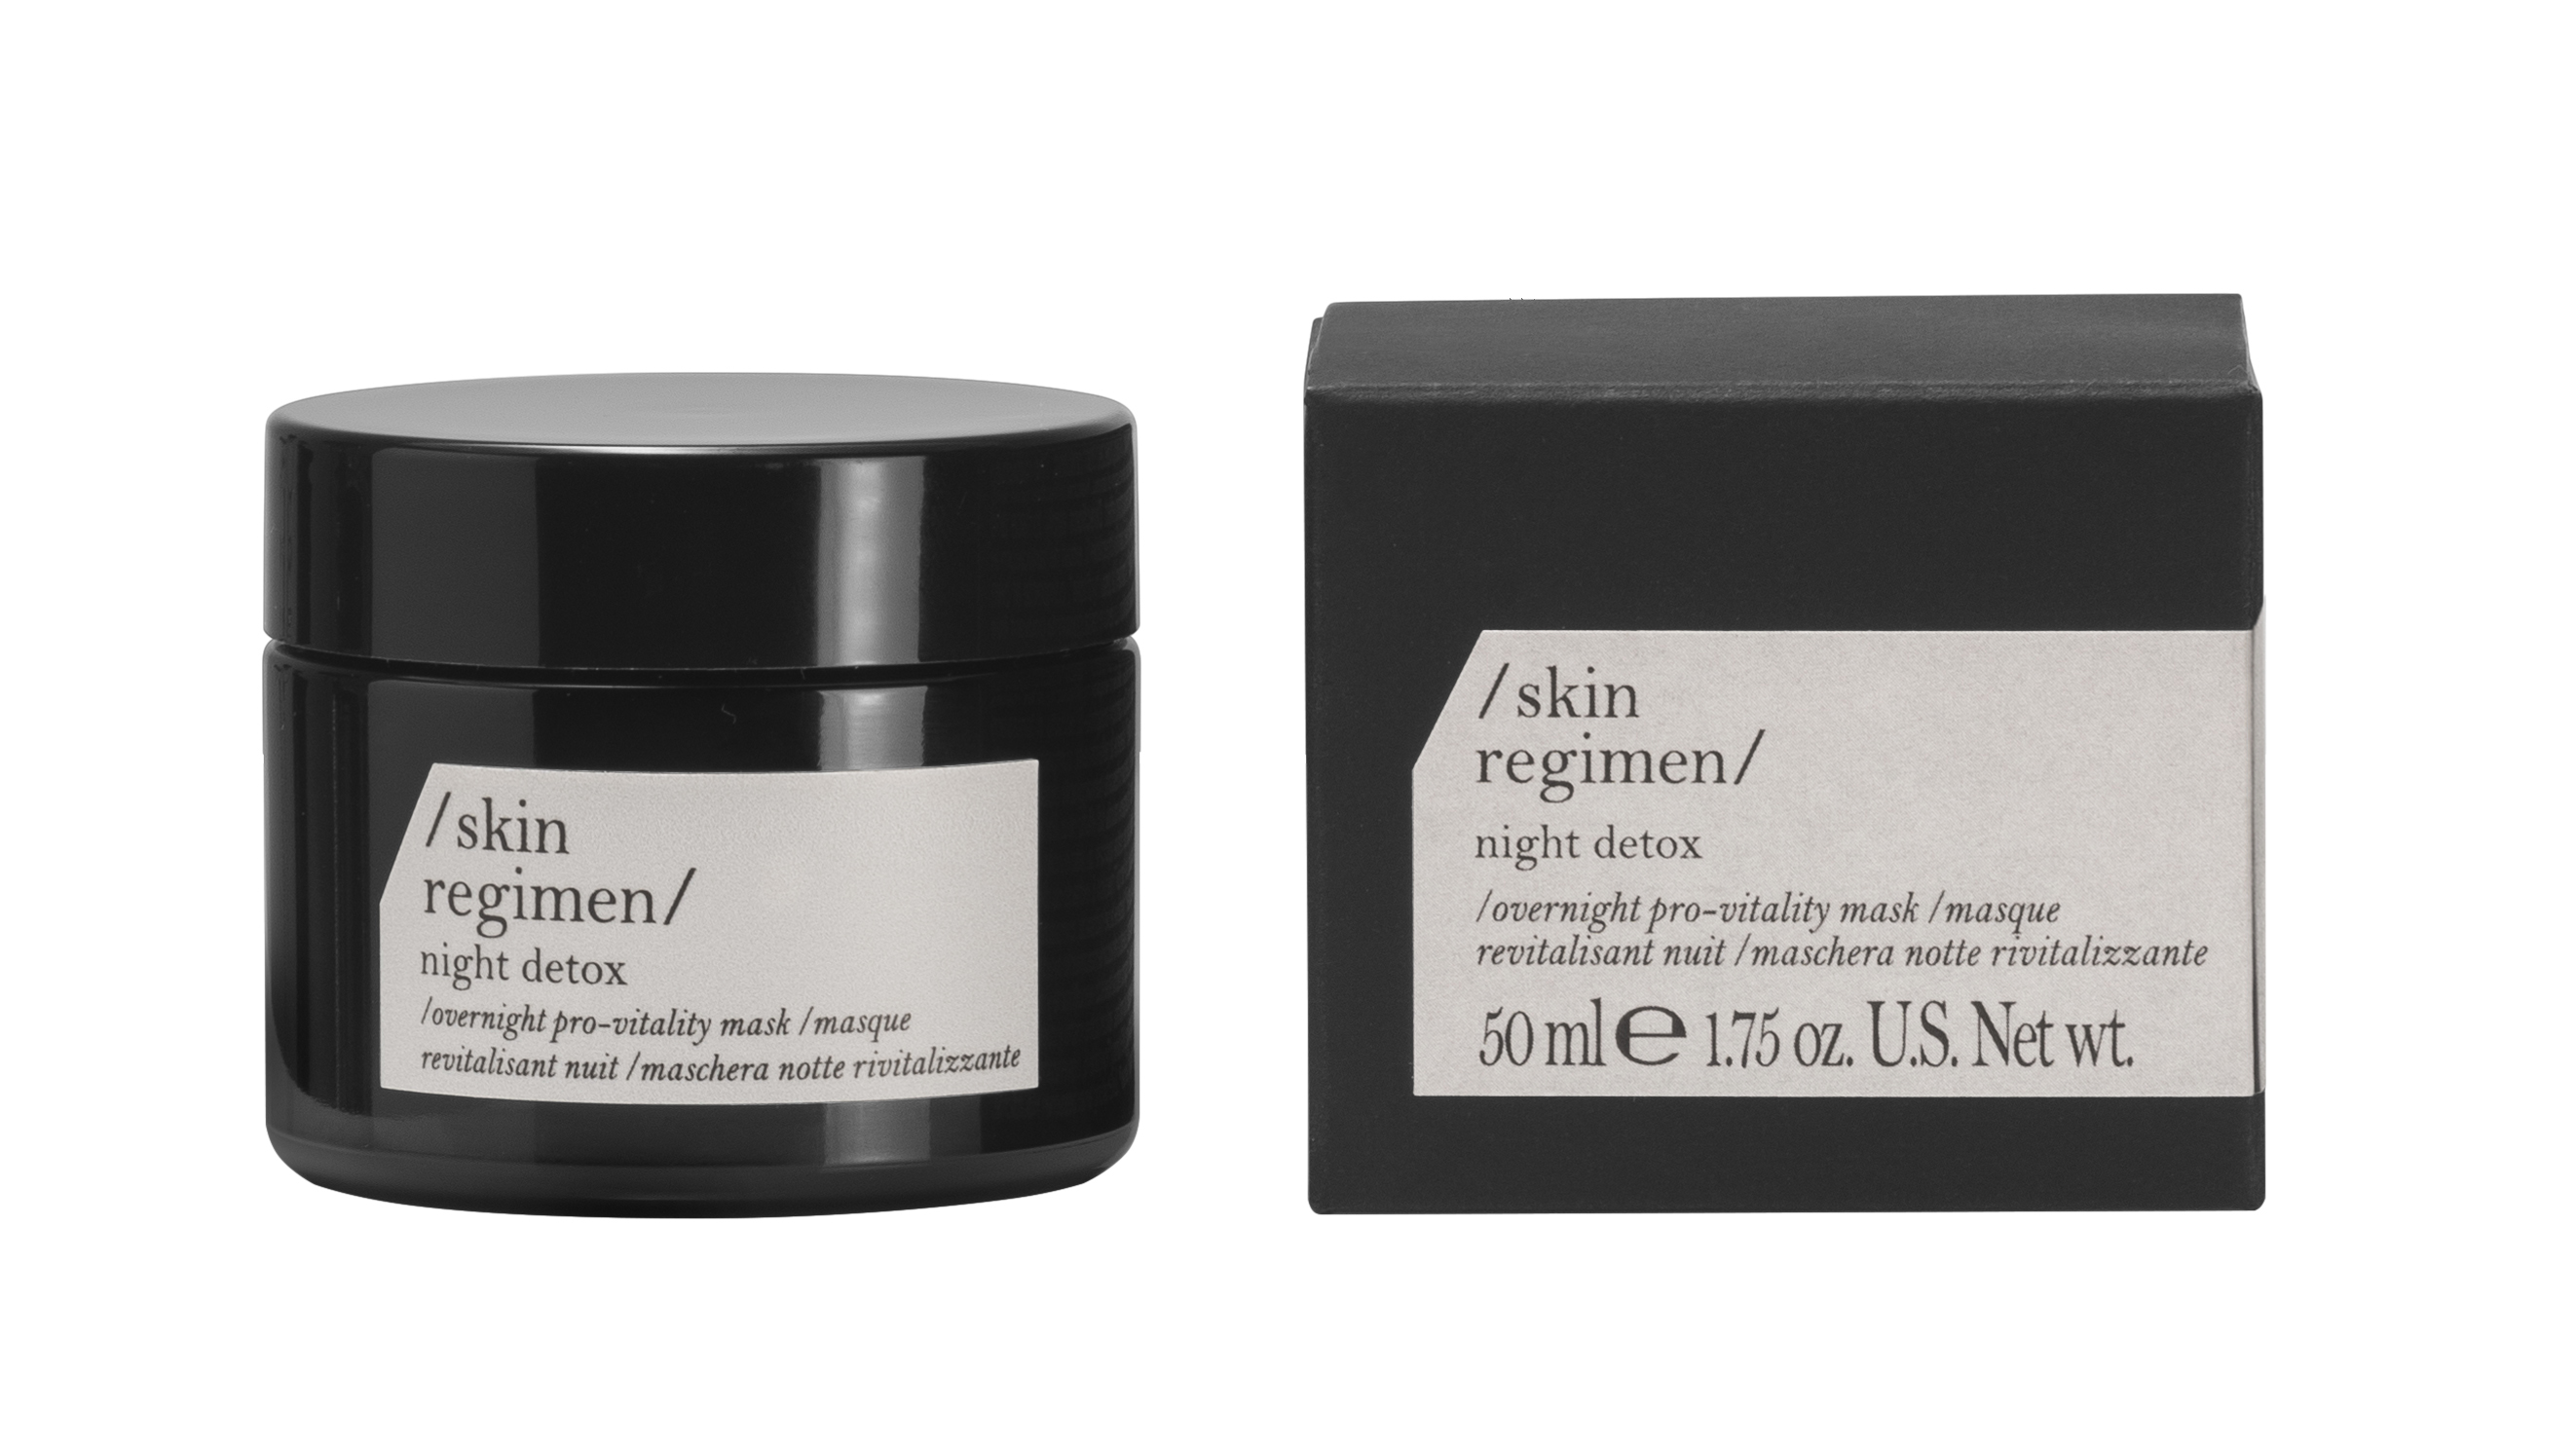 Comfort Zone Skin Regimen Night Detox Mask, 50 ml